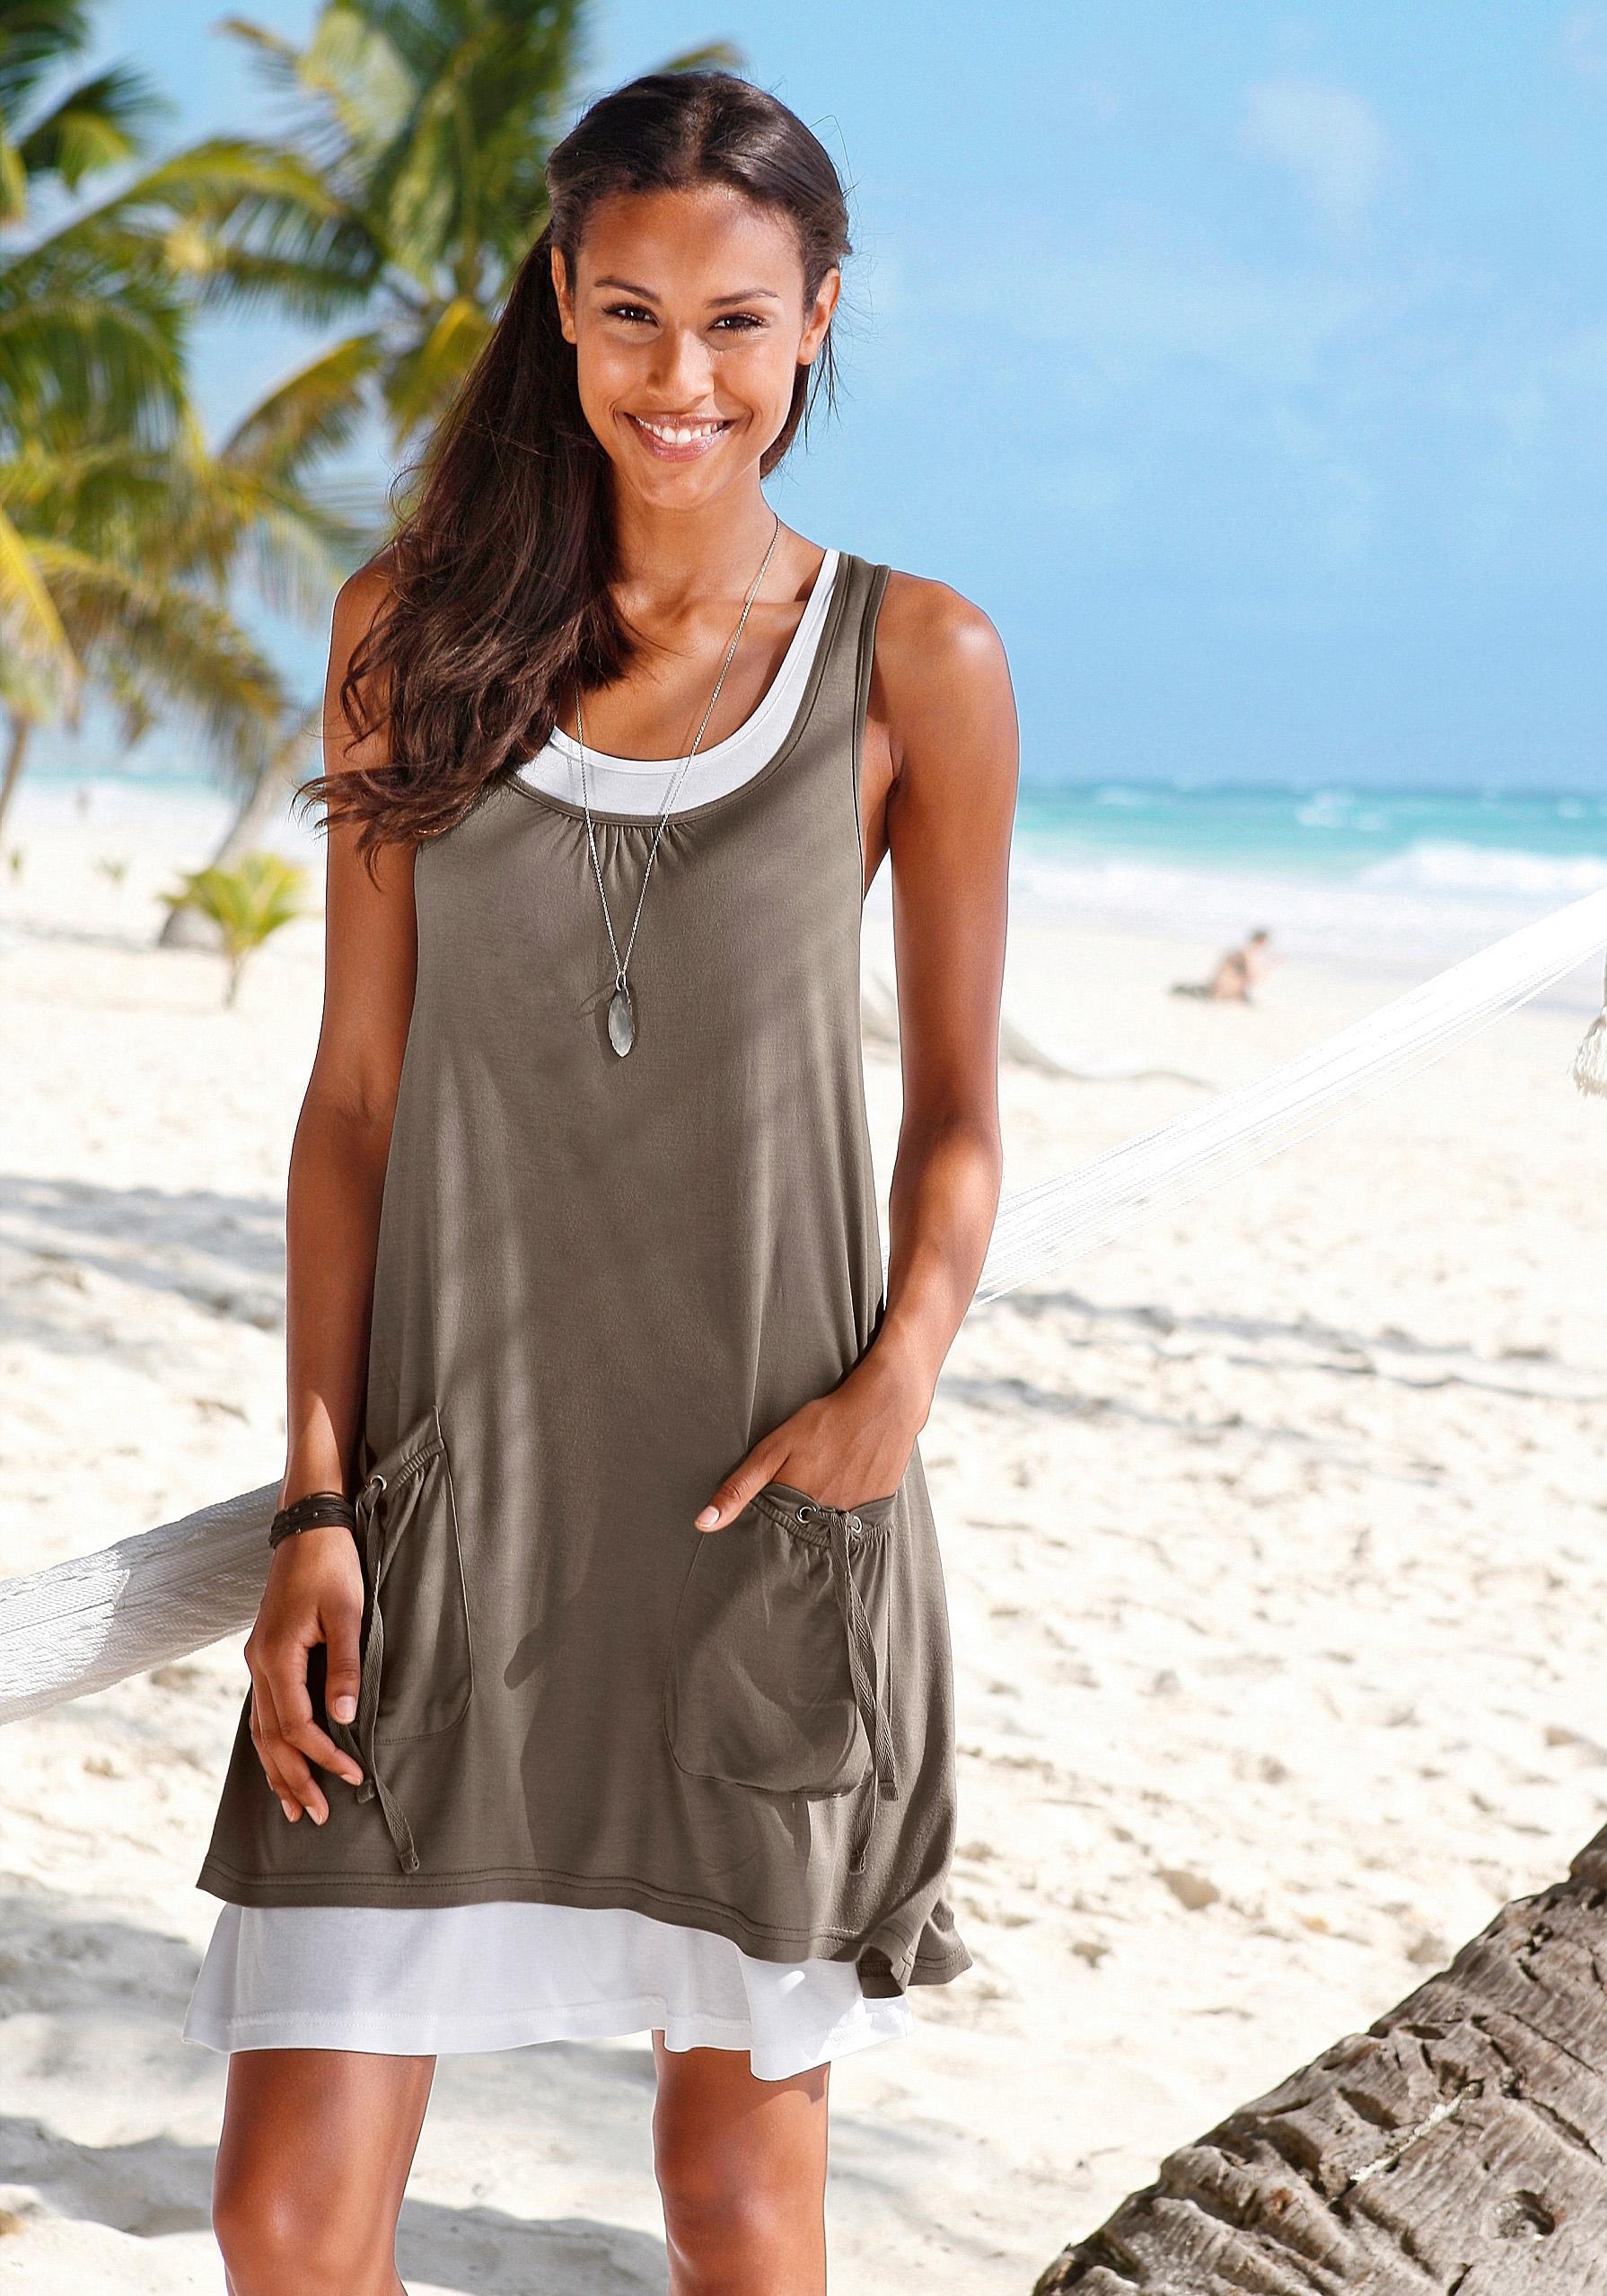 beachtime Strandjurk, Beach Time nu online kopen bij Lascana